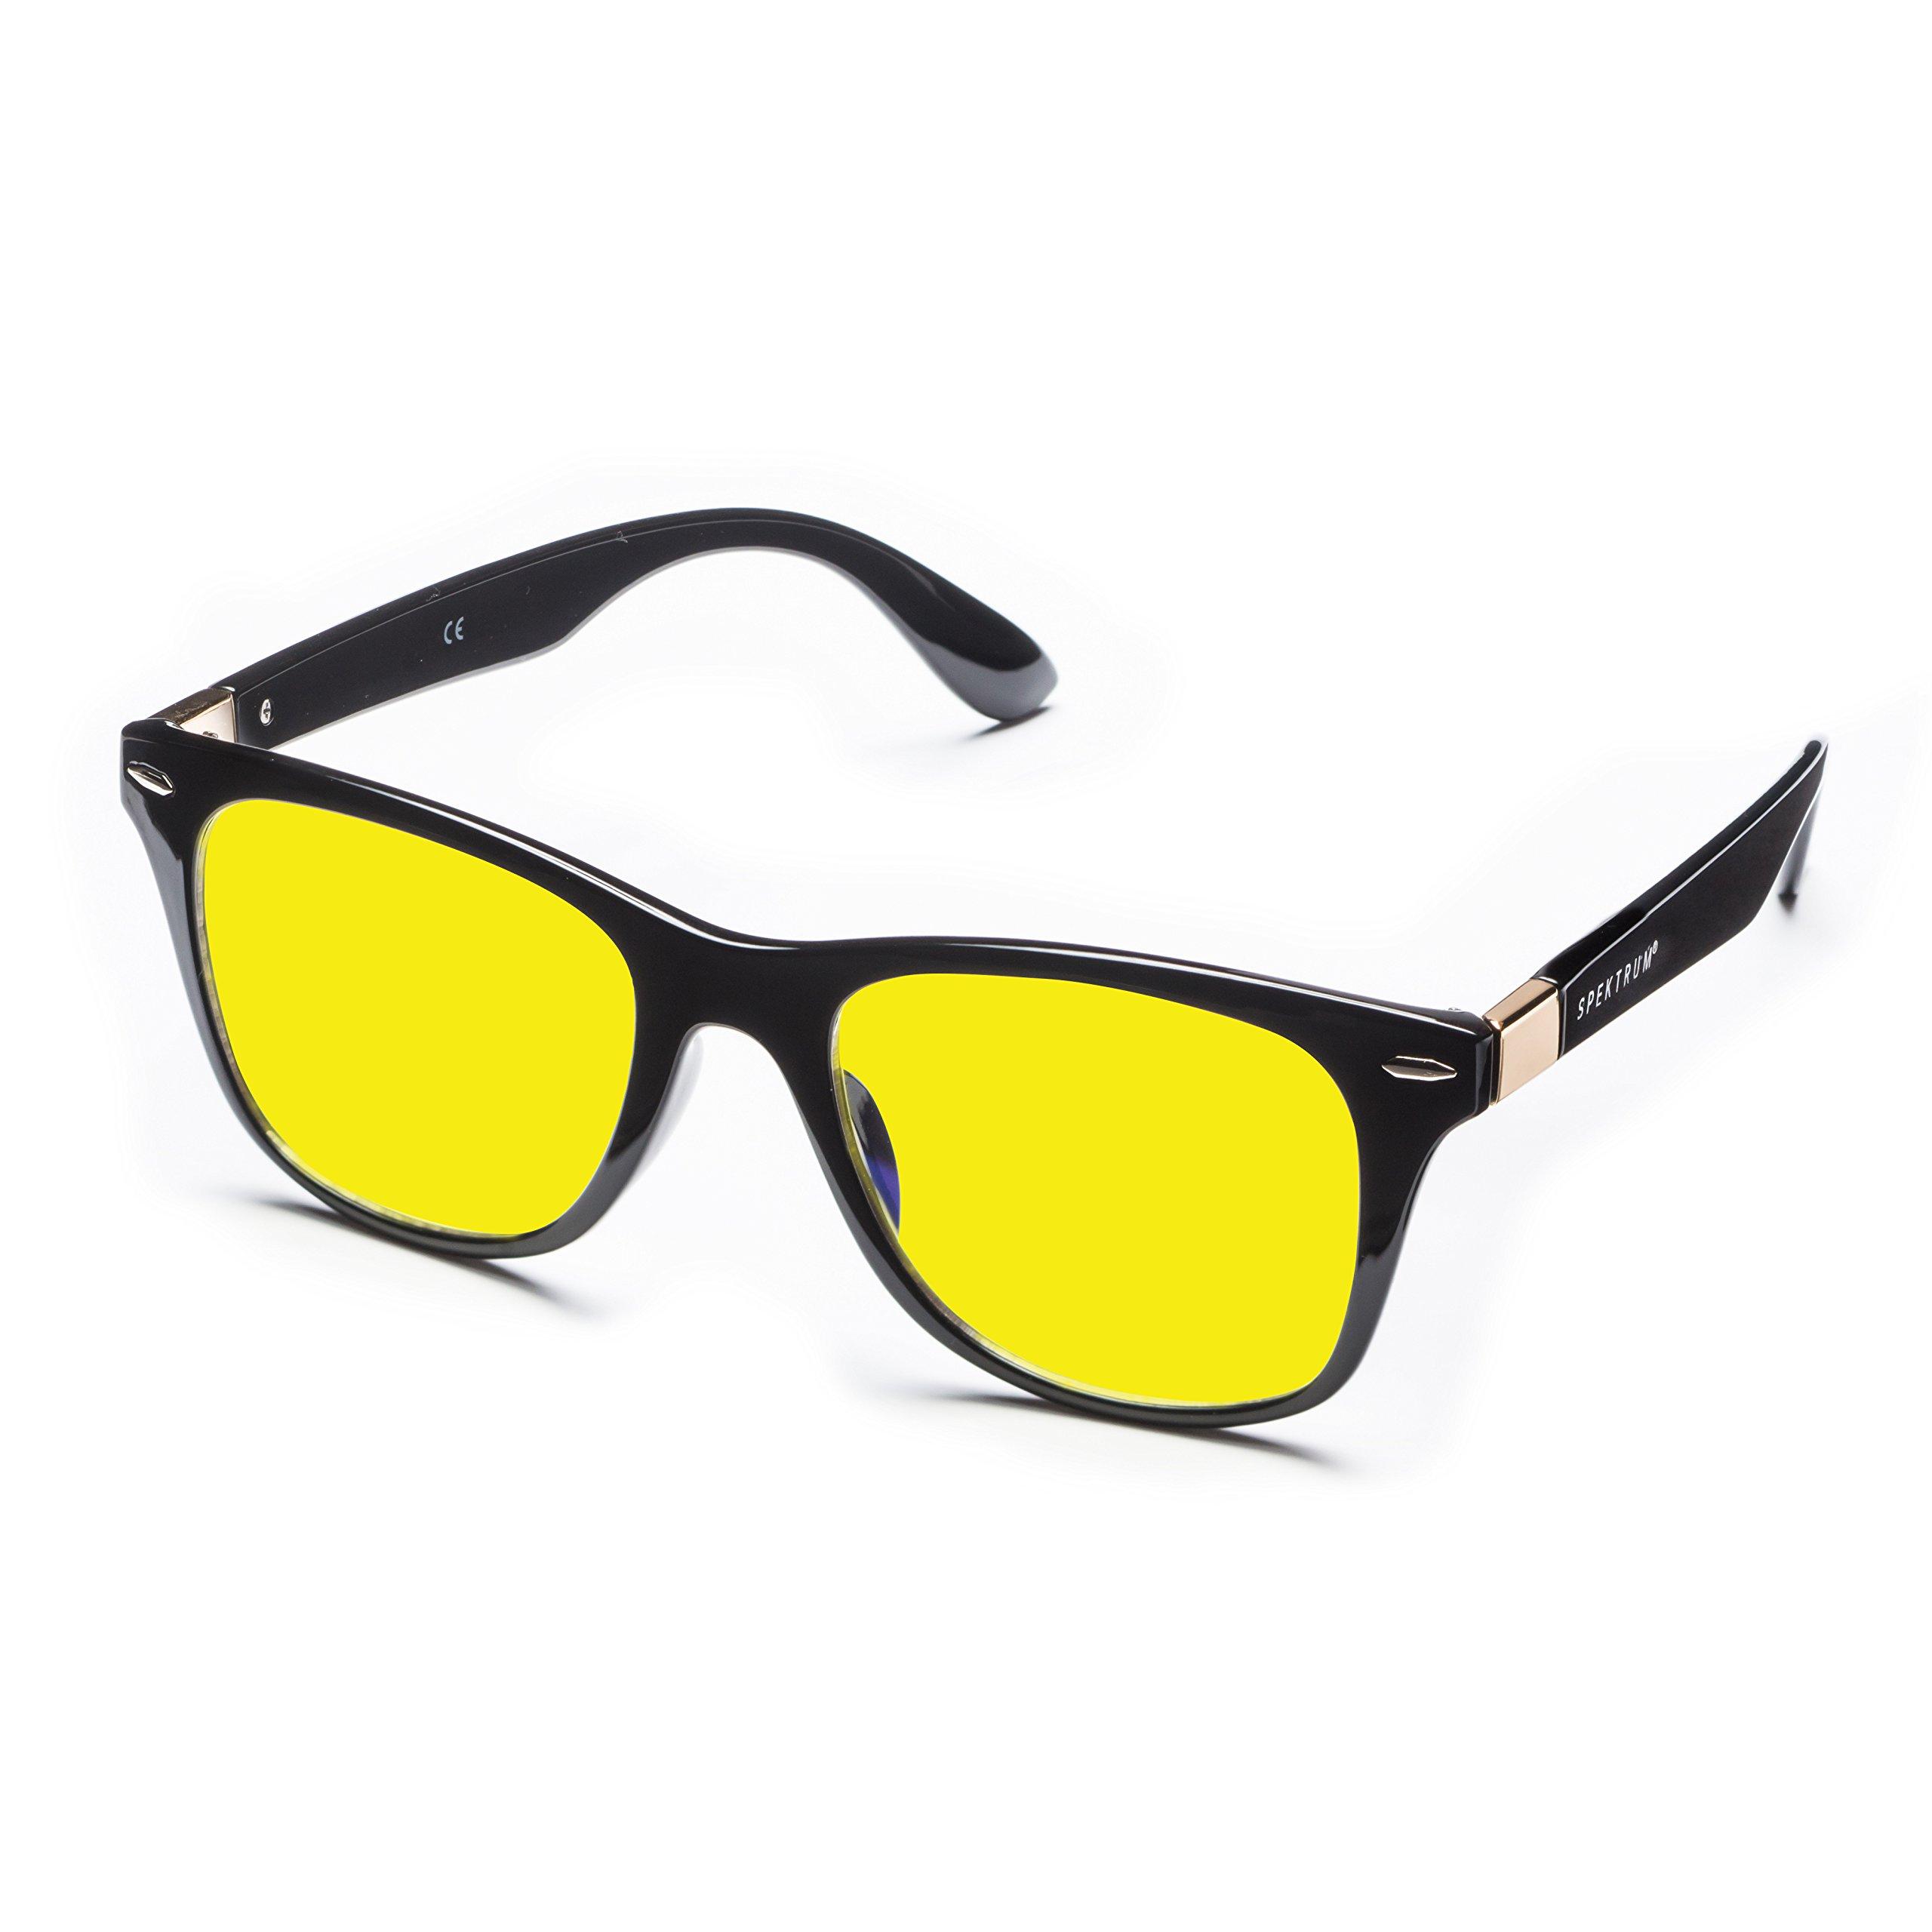 PROSPEK Computer Glasses - Blue Light Blocking Glasses - Ultimate